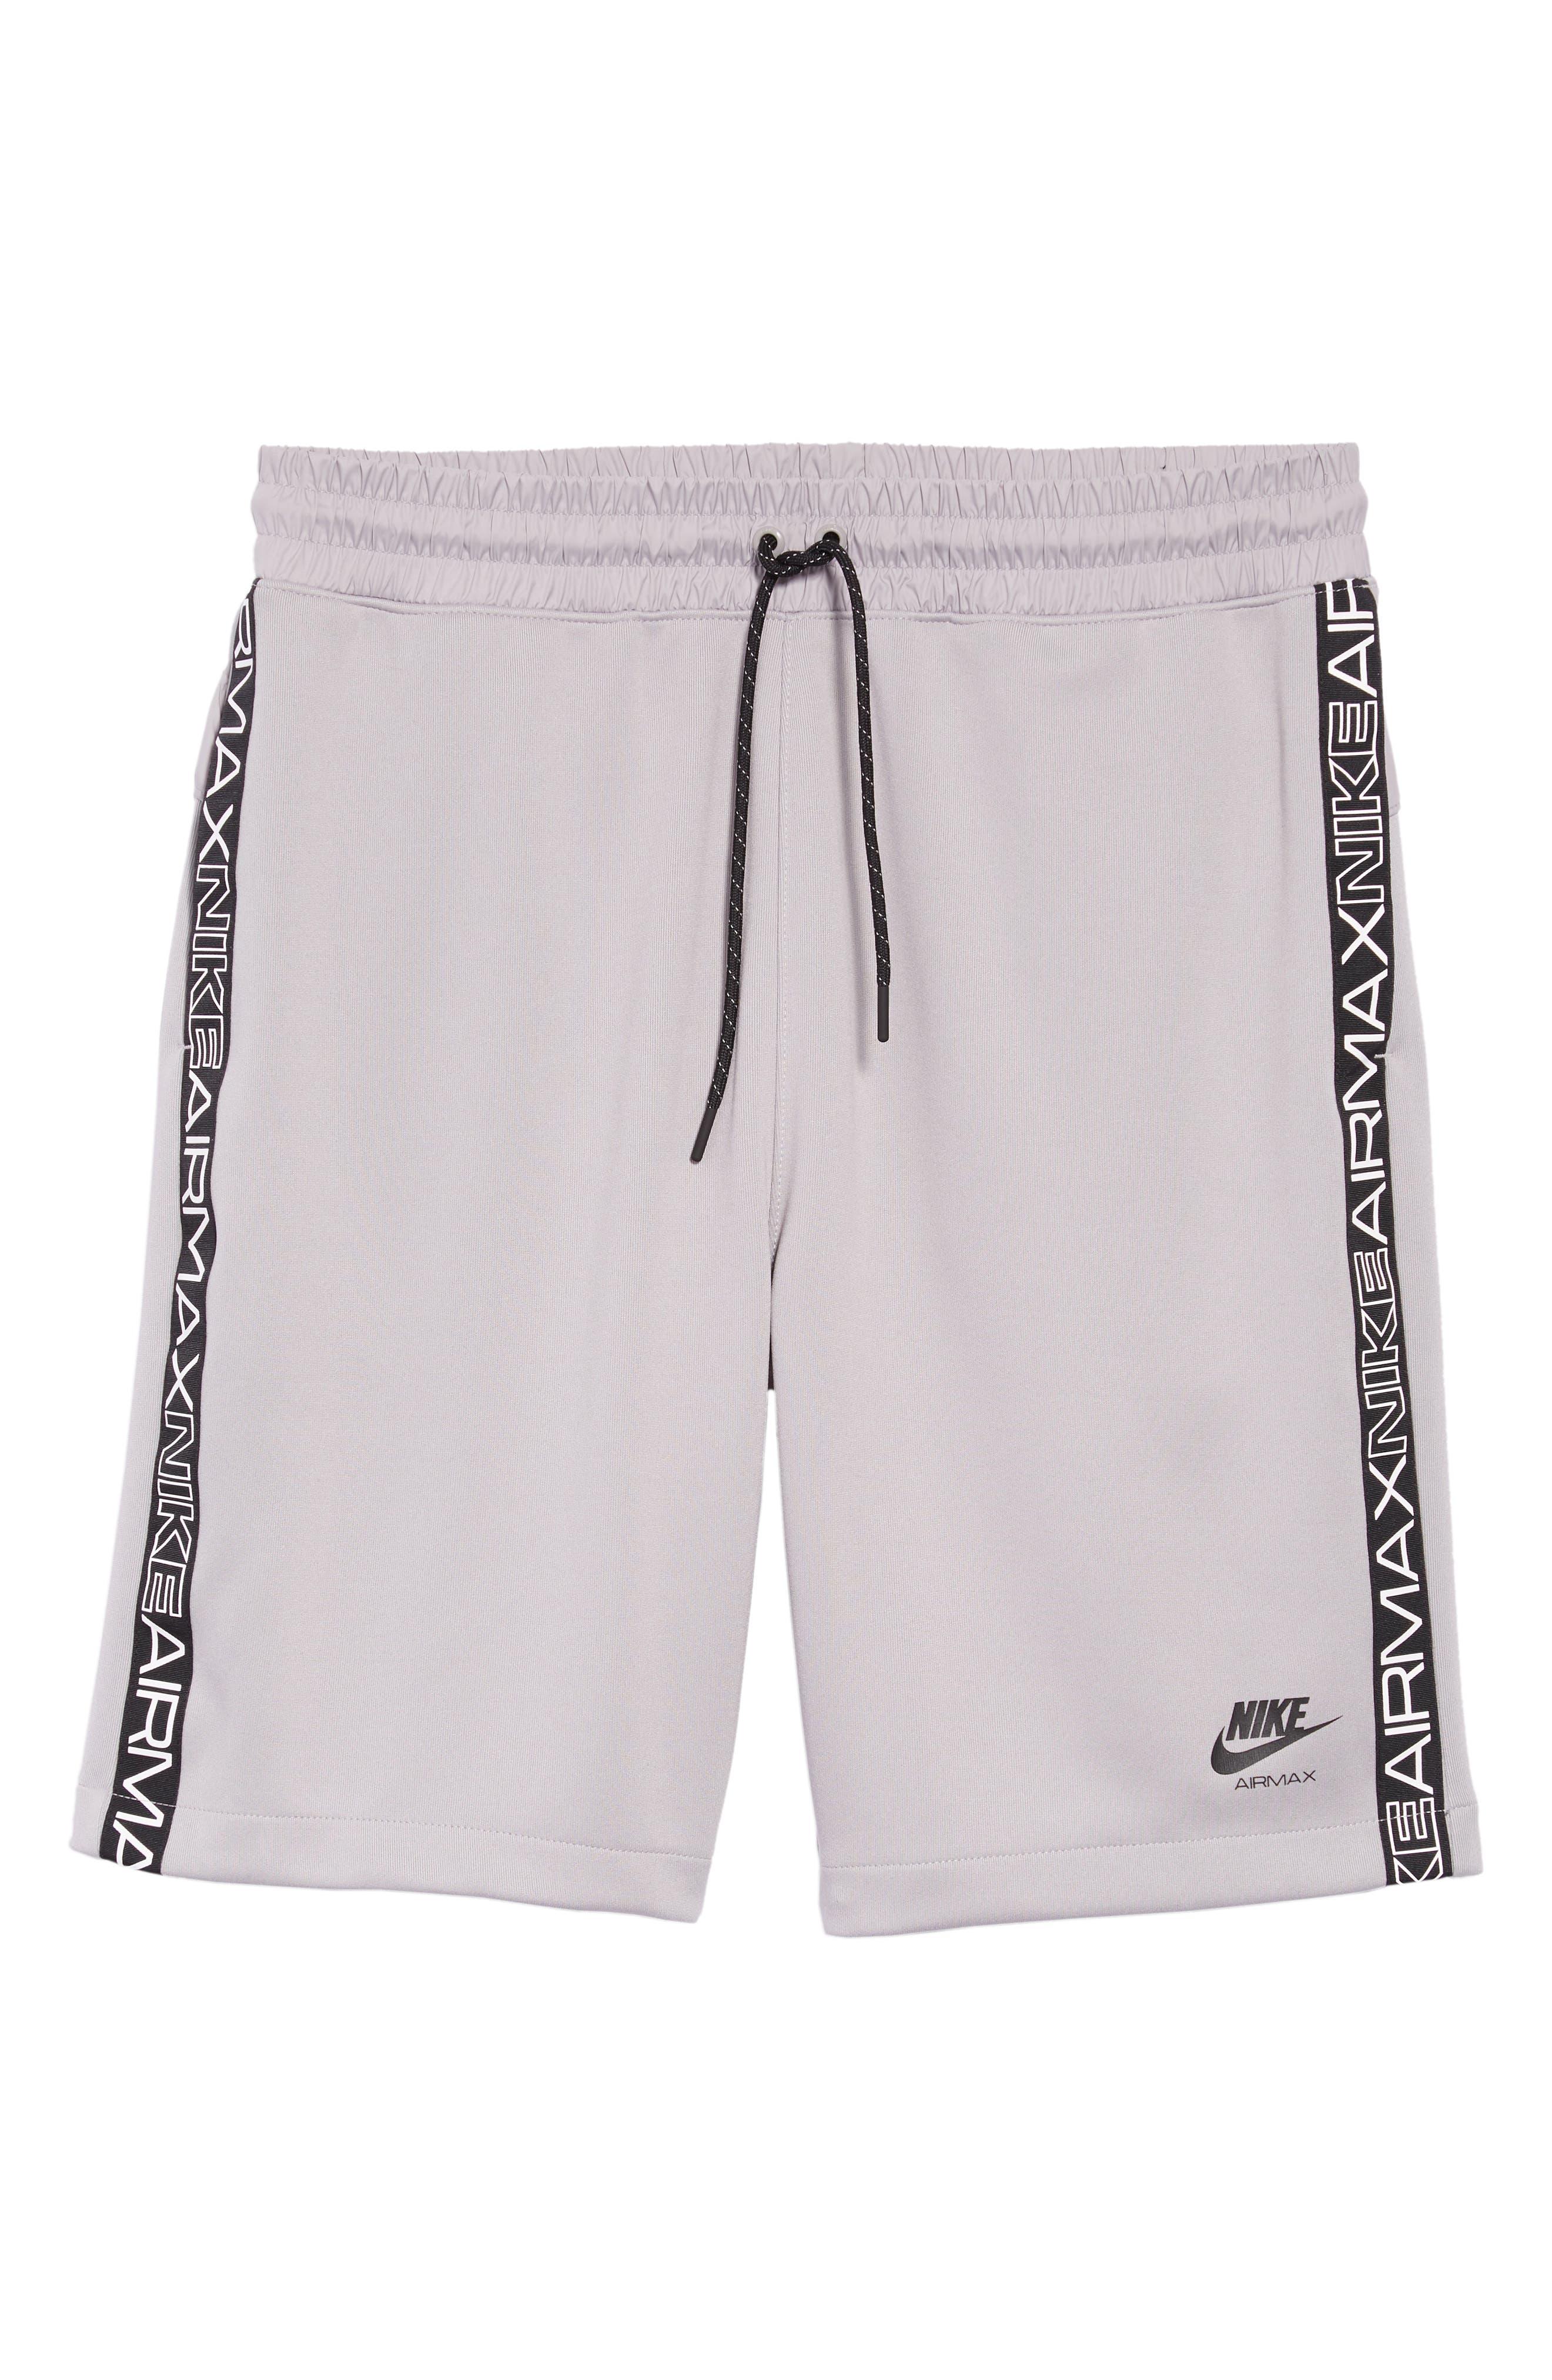 Sportswear Air Max Shorts,                             Alternate thumbnail 12, color,